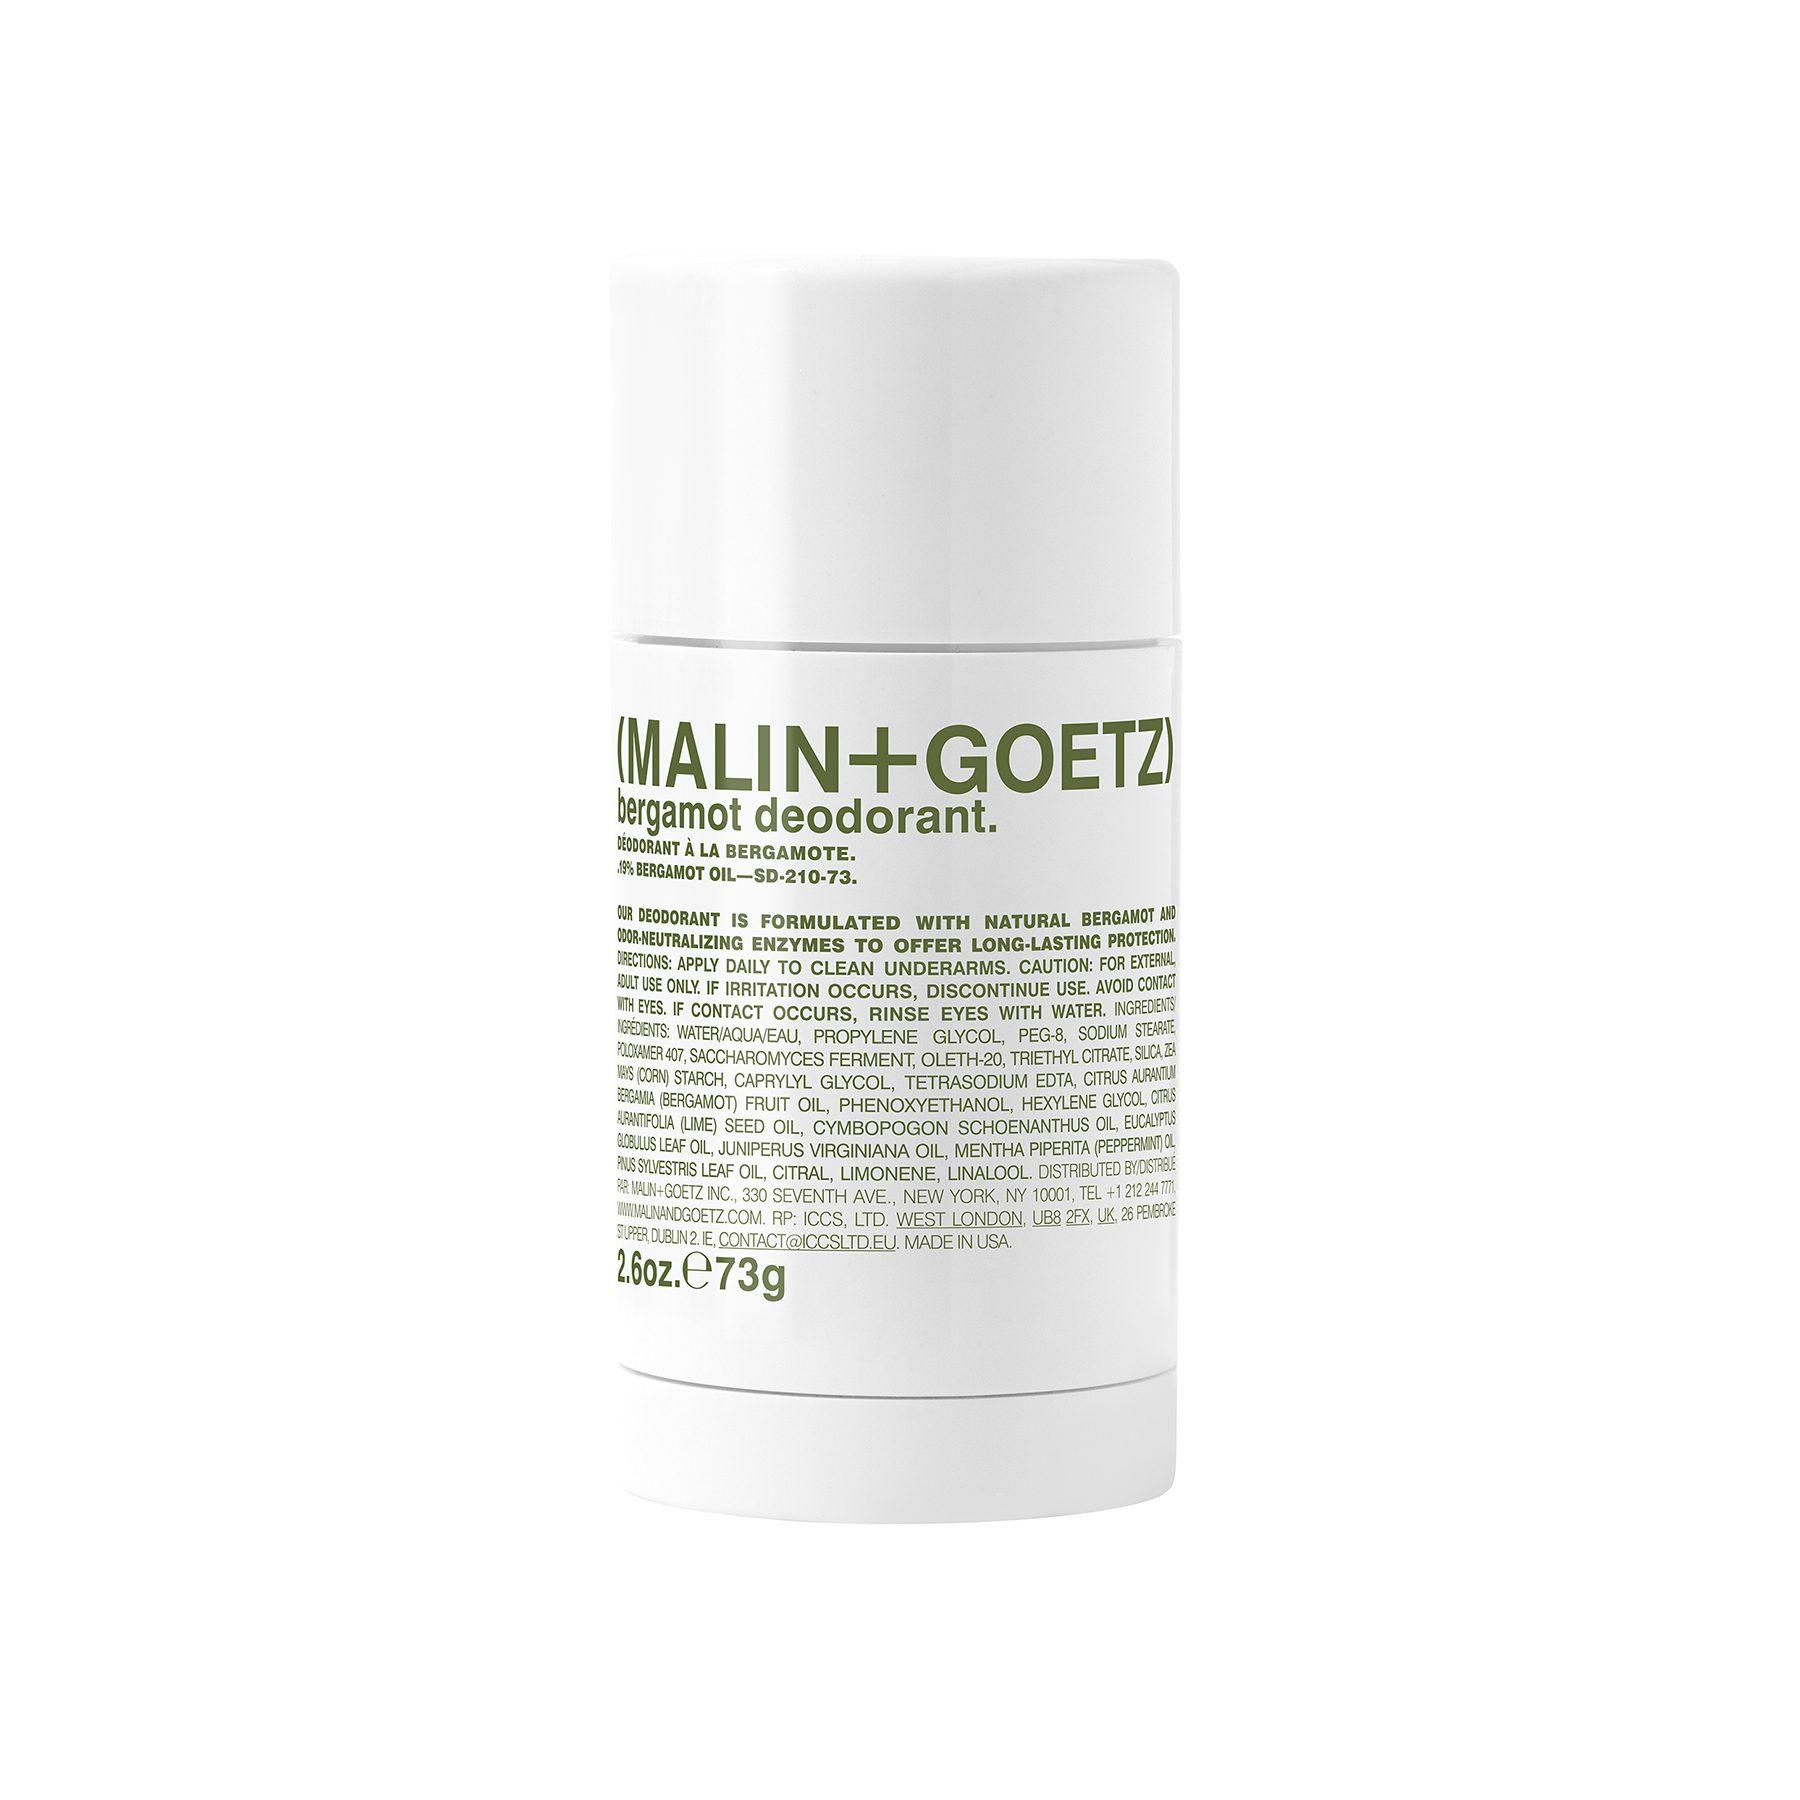 Malin + Goetz Bergamot Deodorant